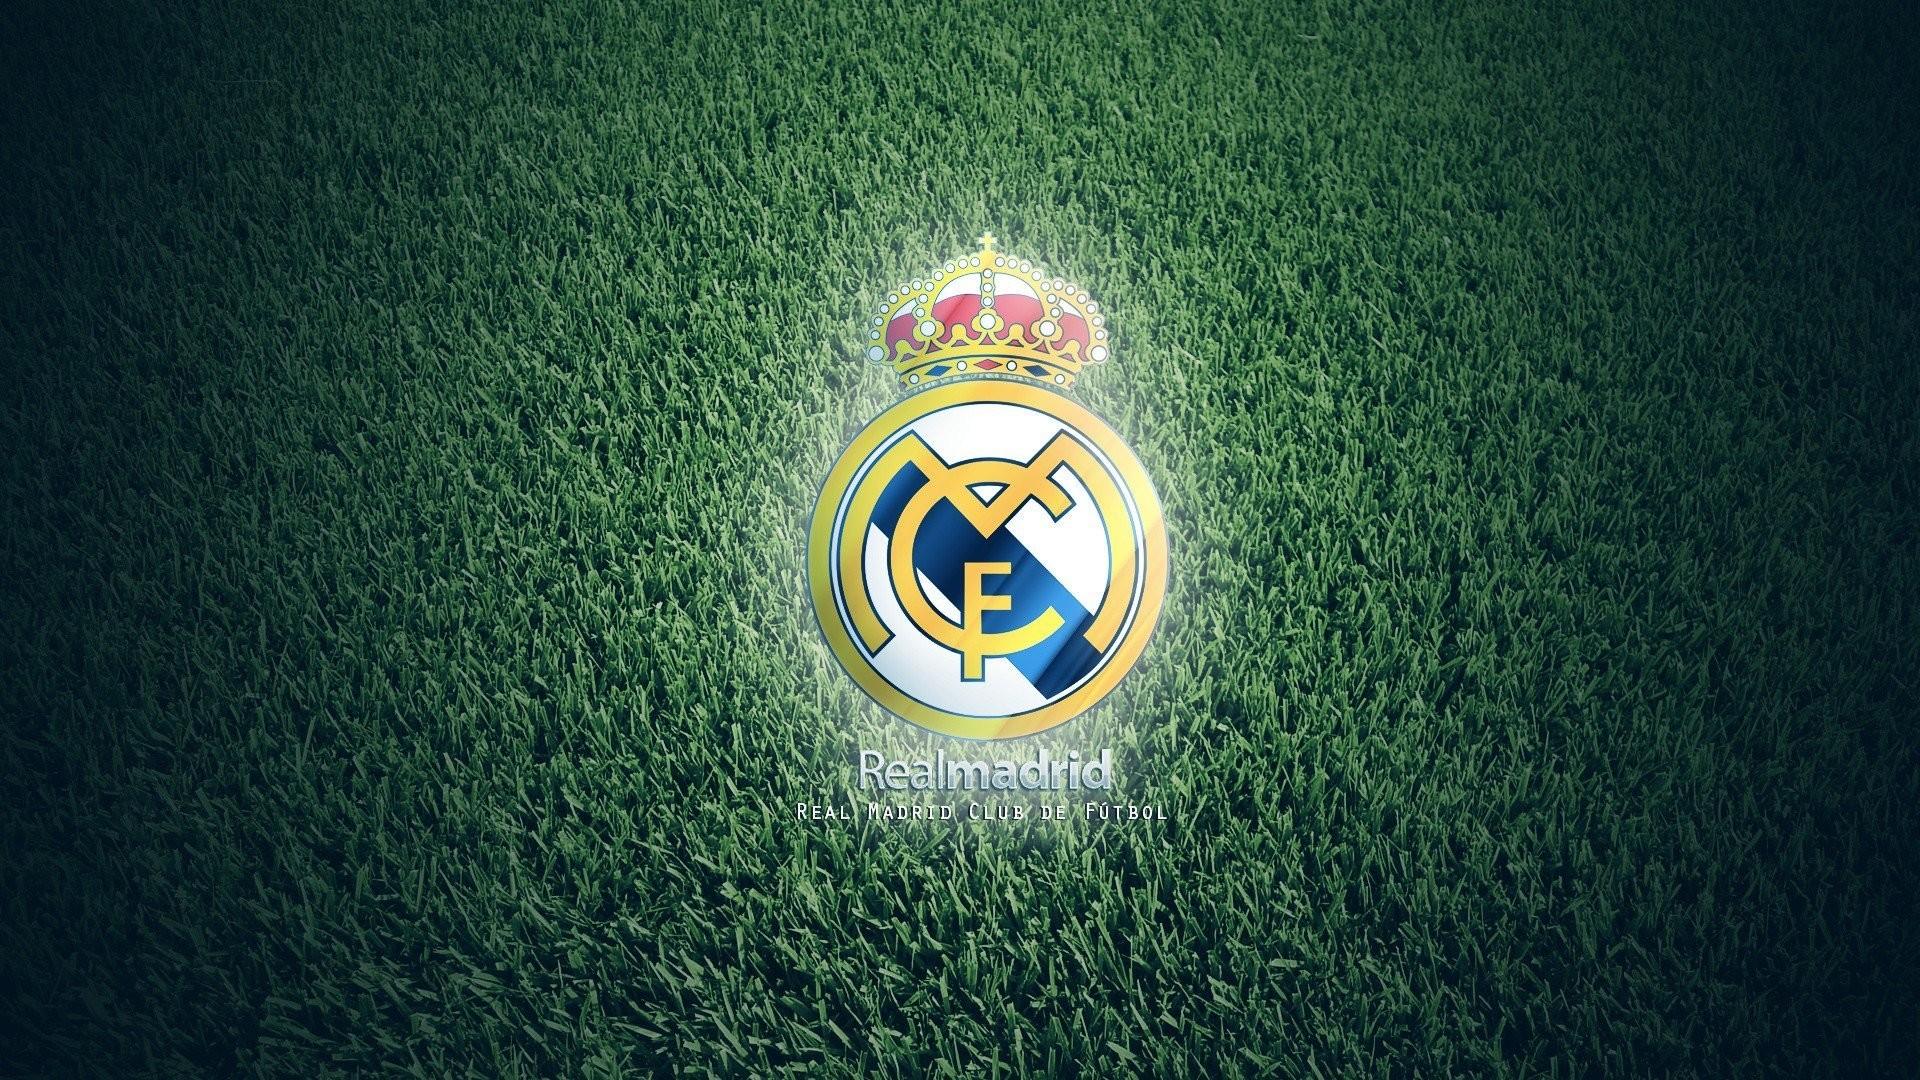 12 Real Madrid Hd 2018 Wallpapers On Wallpapersafari